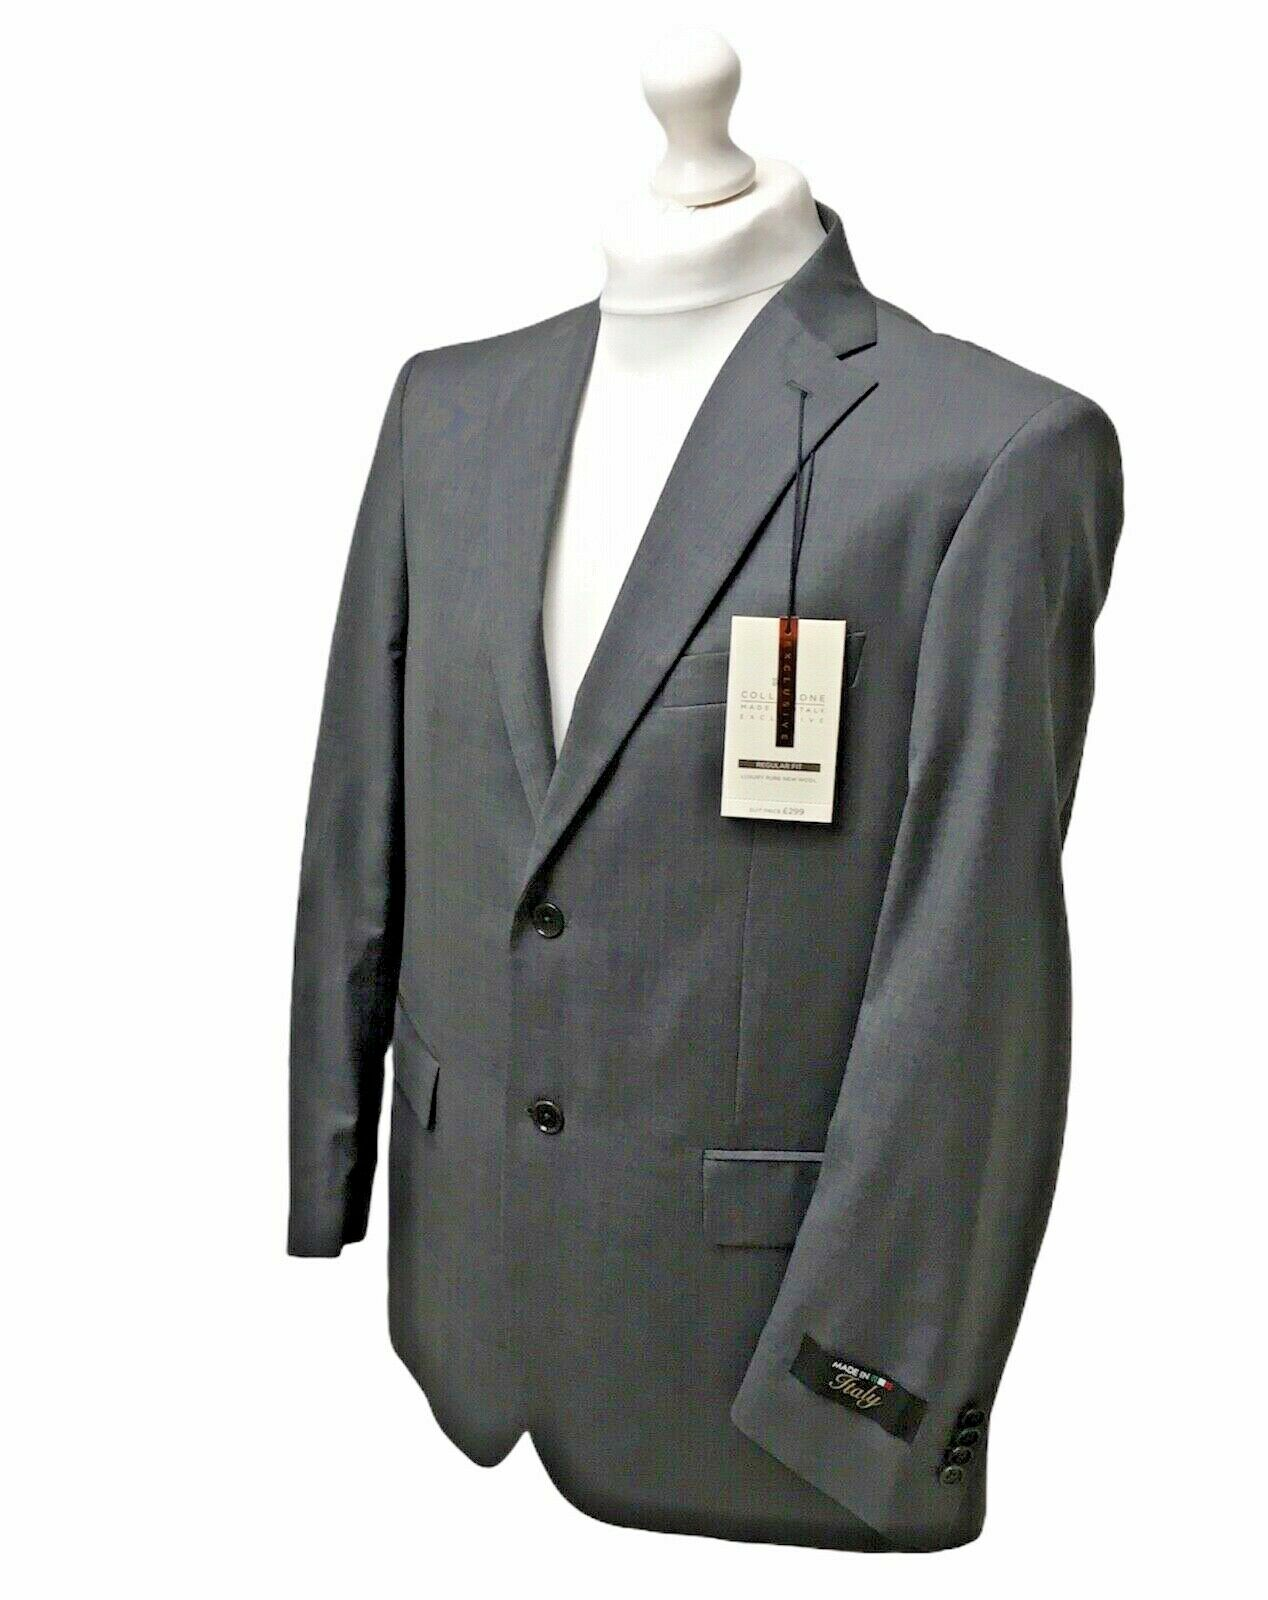 M&S Collezione Zignone Italy New Wool Mens Blazer Jacket Size UK L 44 RRP